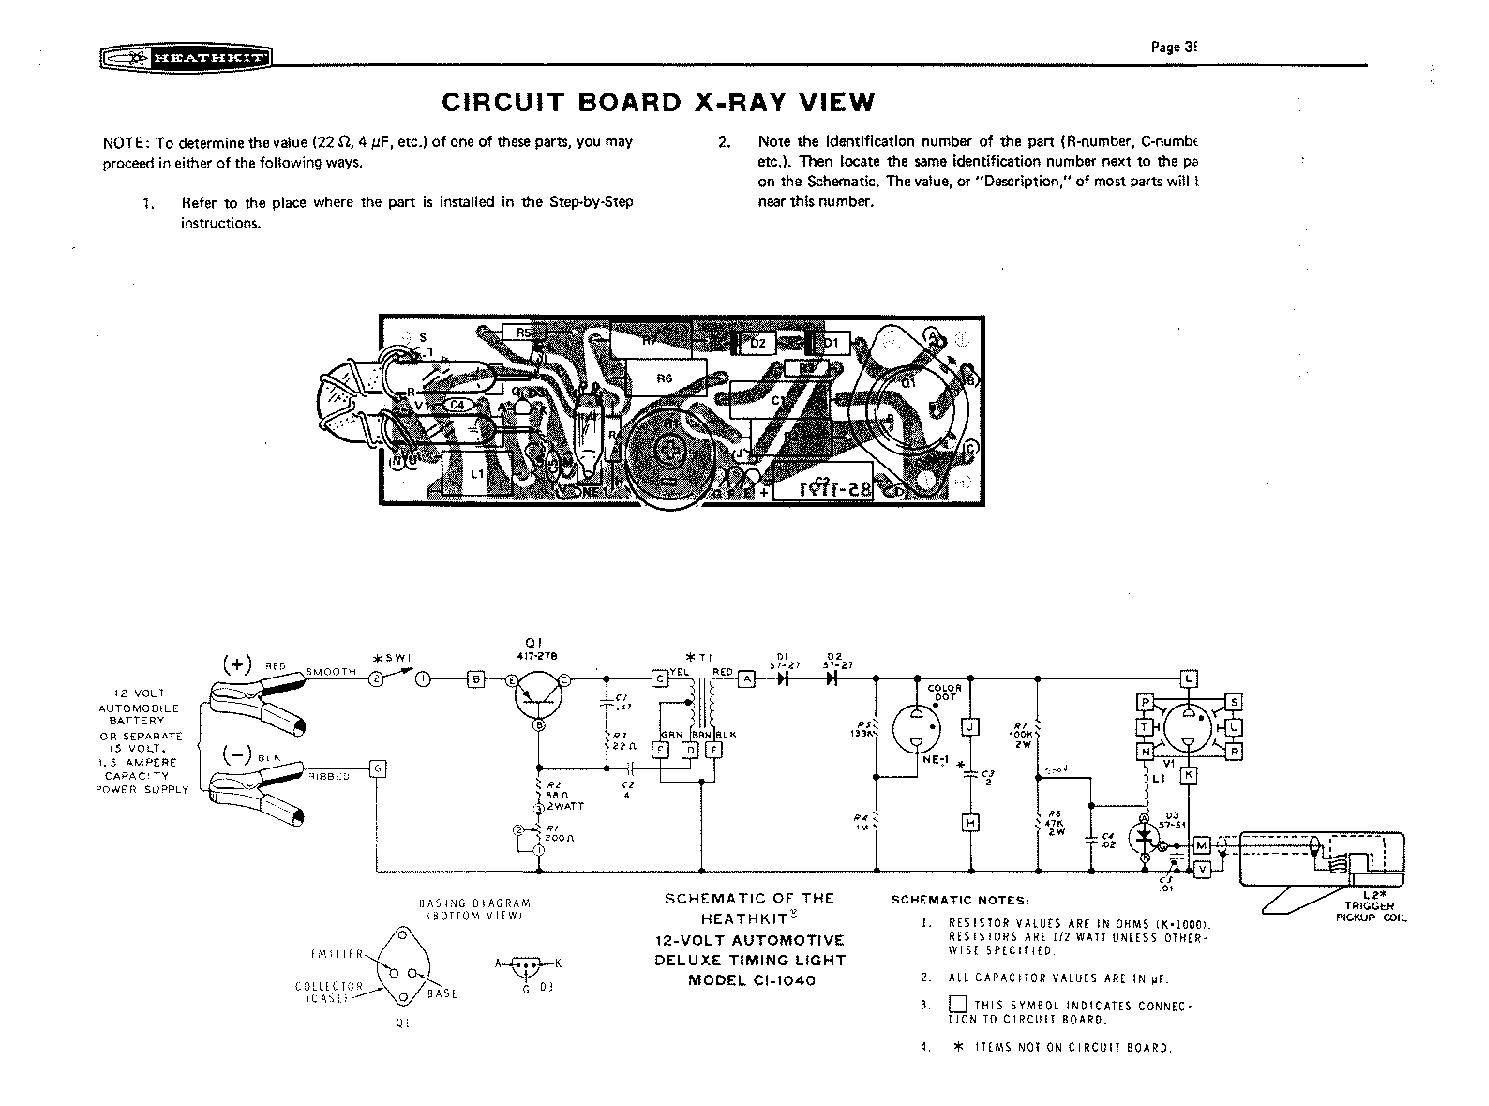 Timing Light Circuit Schematic Information Of Wiring Diagram 12v Timer Heathkit Ci 1040 Automotive 197p Gyujtasmero Rh Elektrotanya Com Relay 555